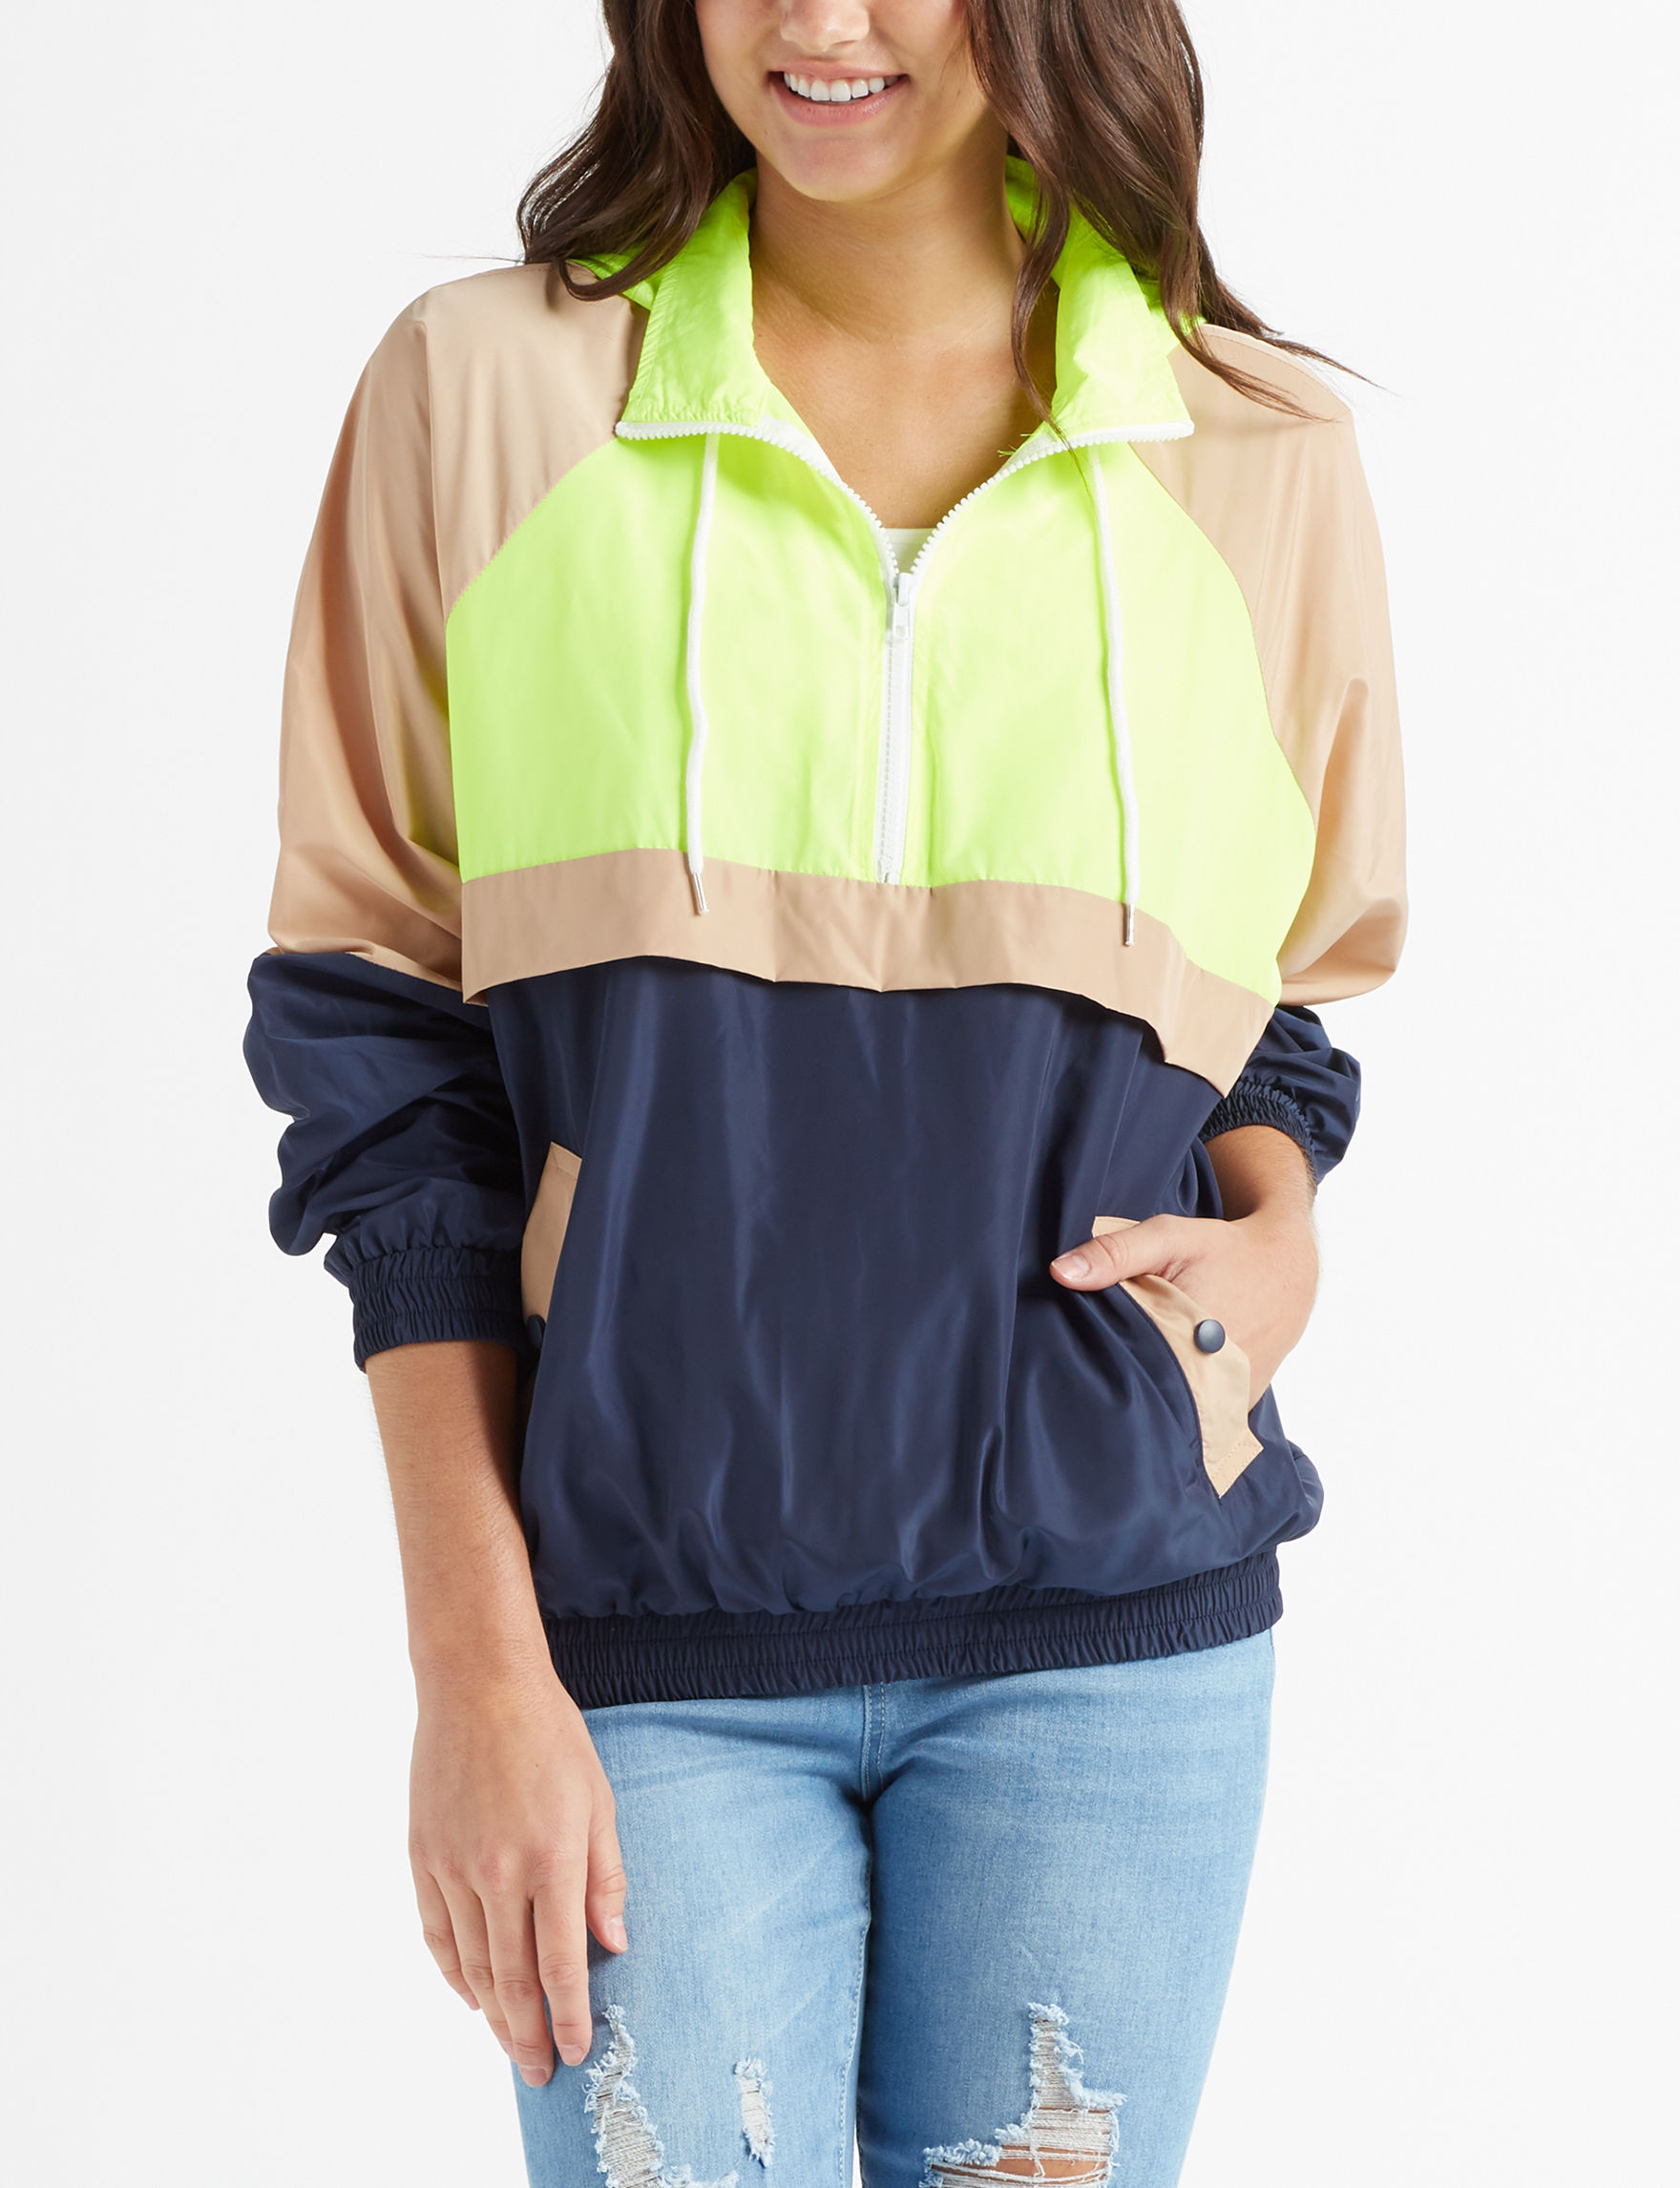 Justify Lime / Multi Lightweight Jackets & Blazers